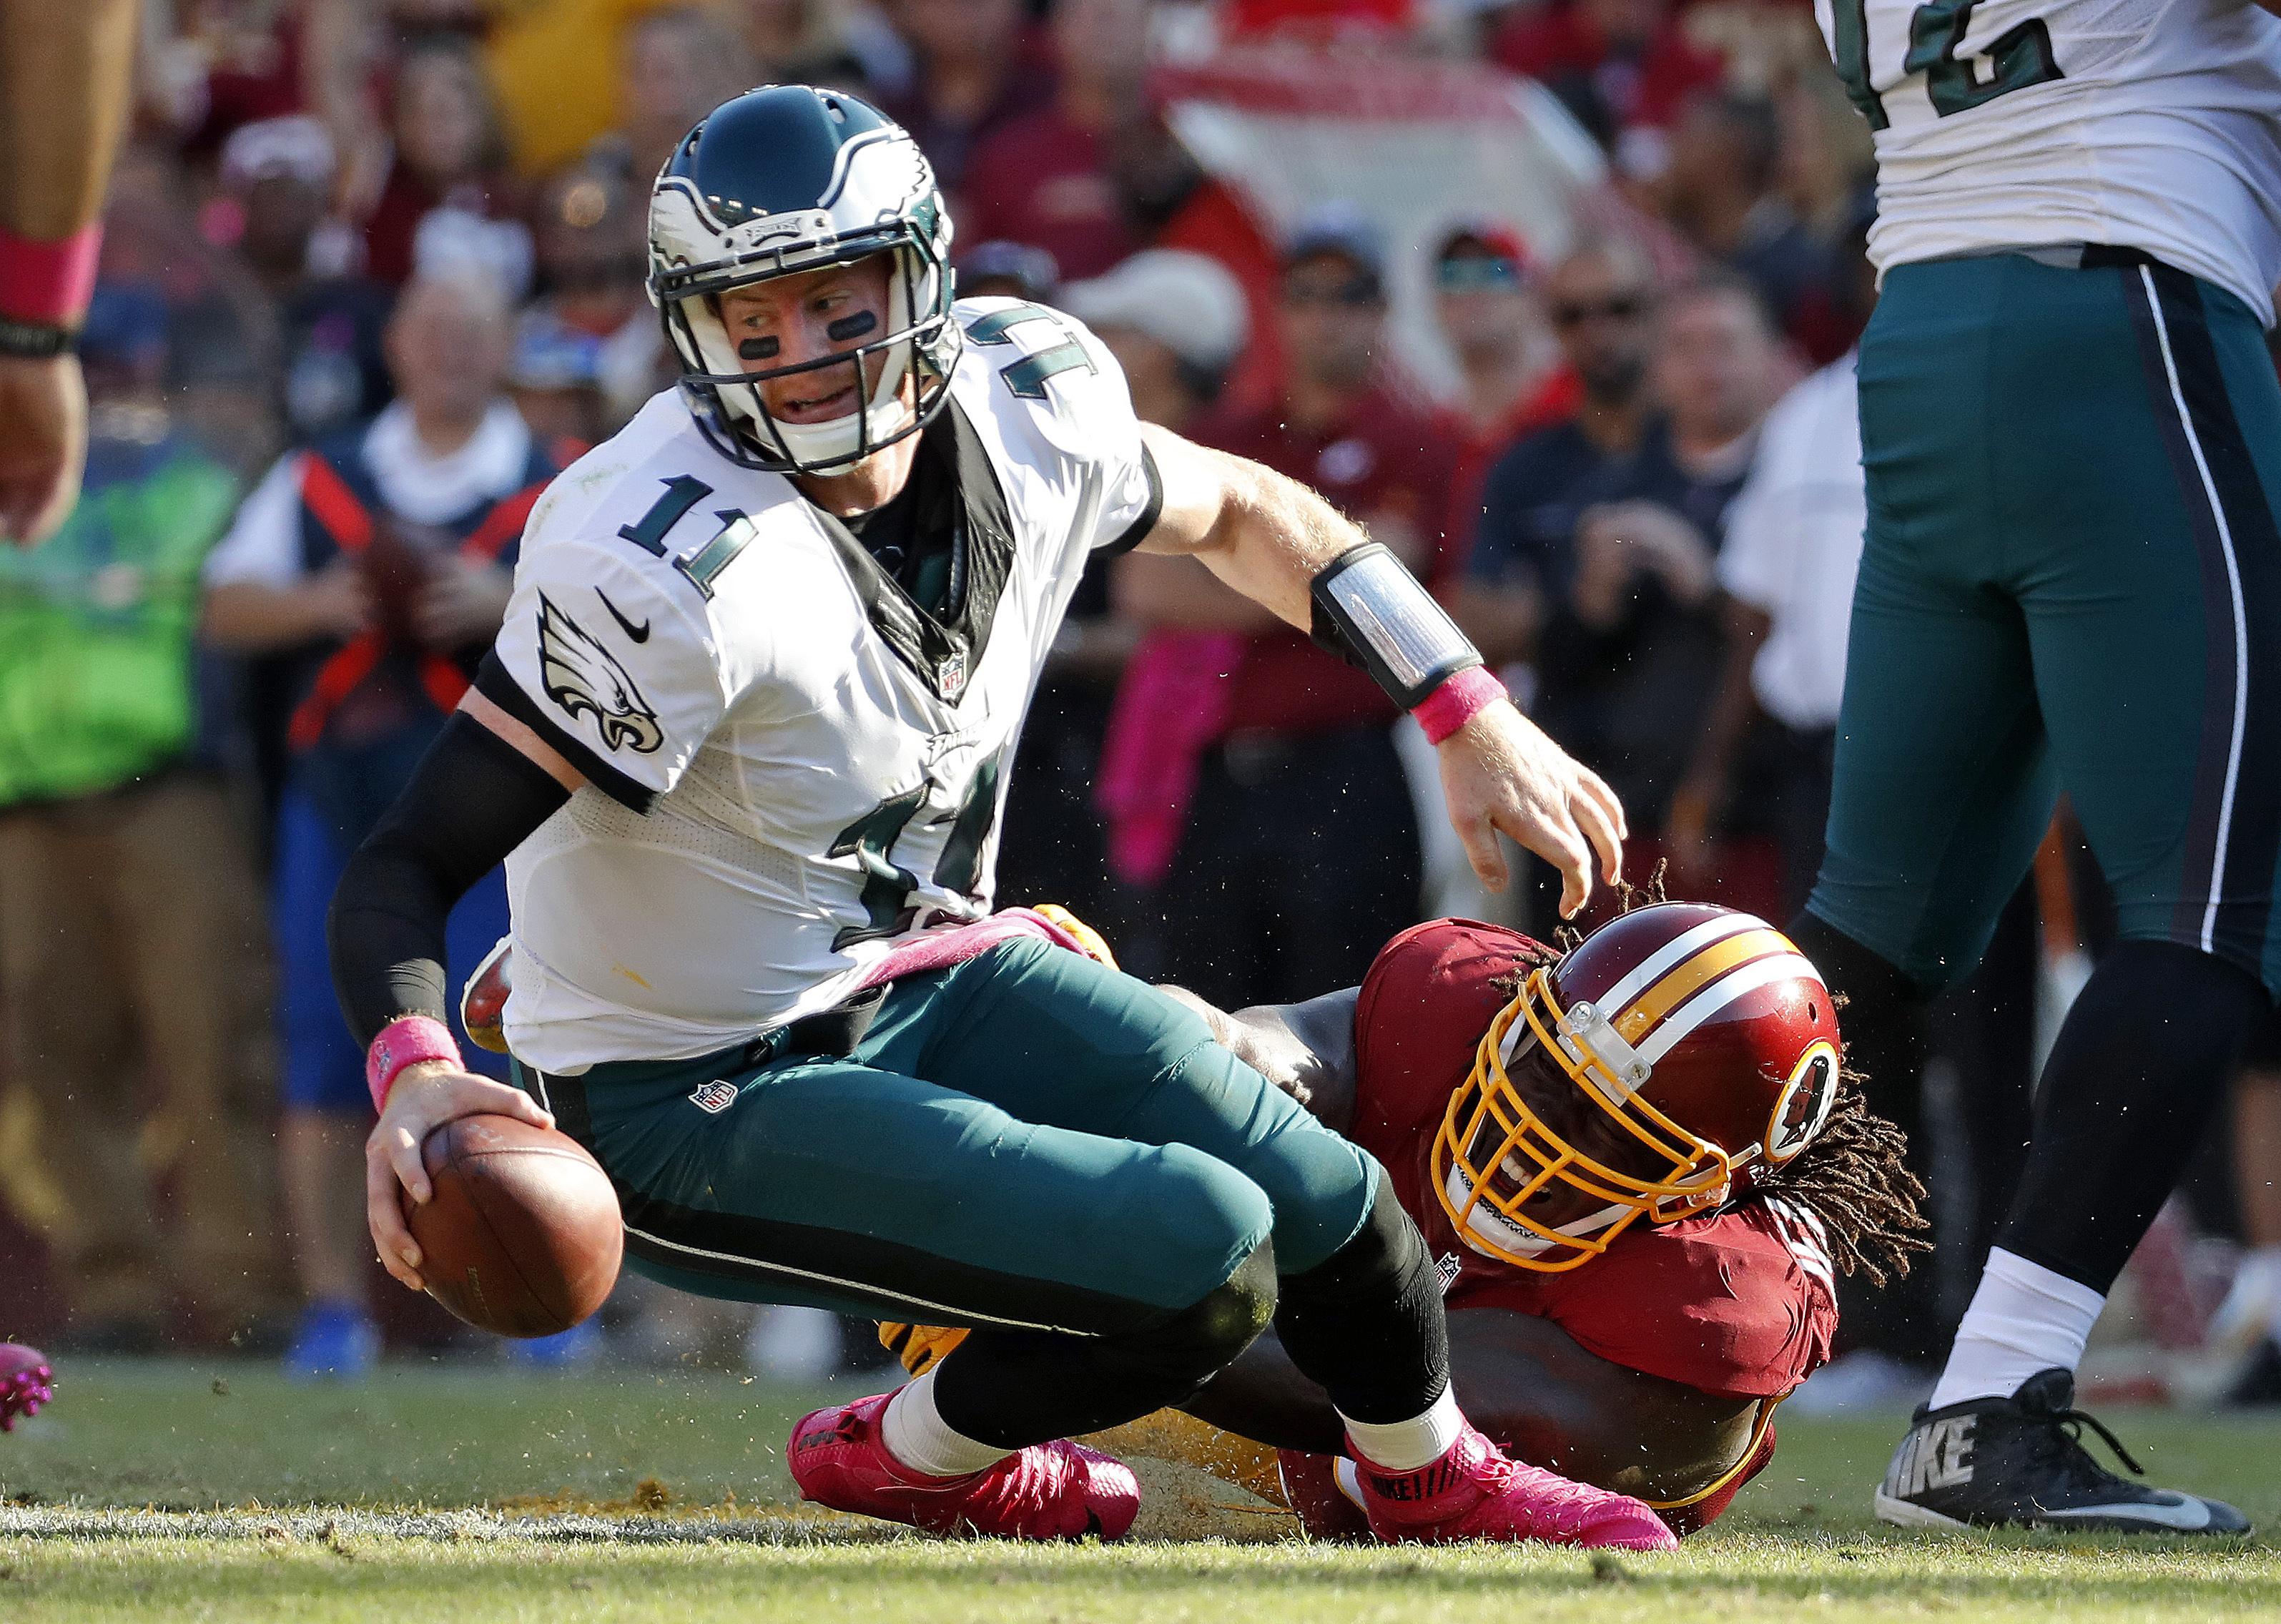 Philadelphia Eagles quarterback Carson Wentz, left, is sacked by Washington Redskins defensive end Ricky Jean Francois in the second half of an NFL football game, Sunday, Oct. 16, 2016, in Landover, Md. Washington won 27-20. (AP Photo/Alex Brandon)